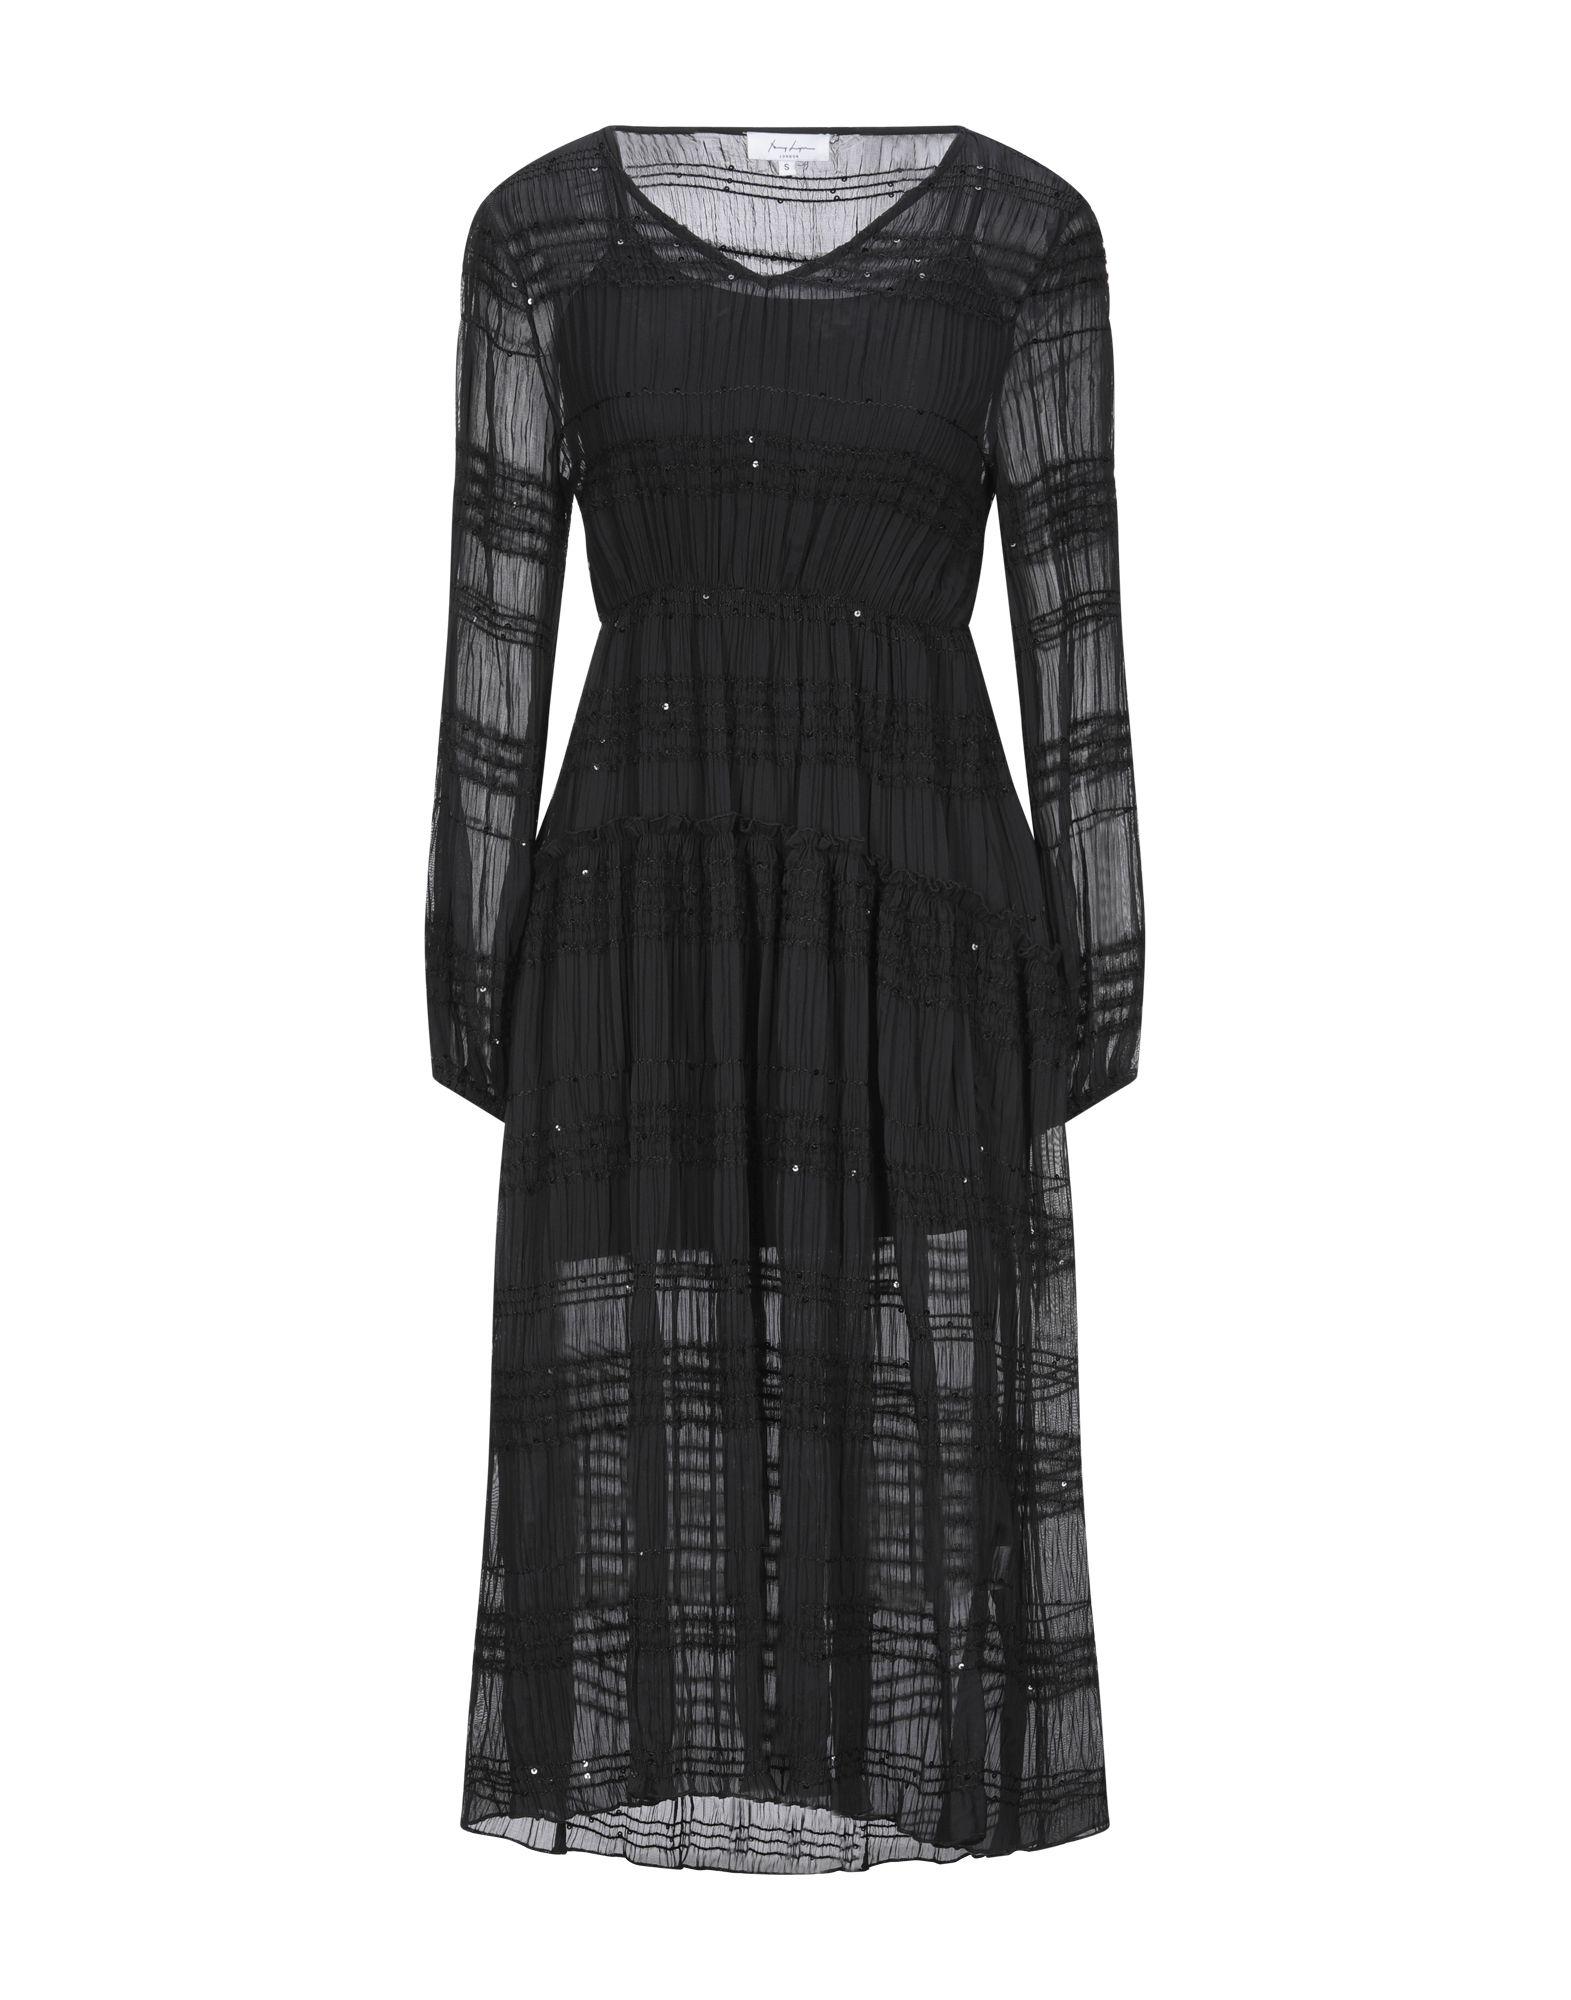 AMY LYNN Платье длиной 3/4 cherrie lynn raw need